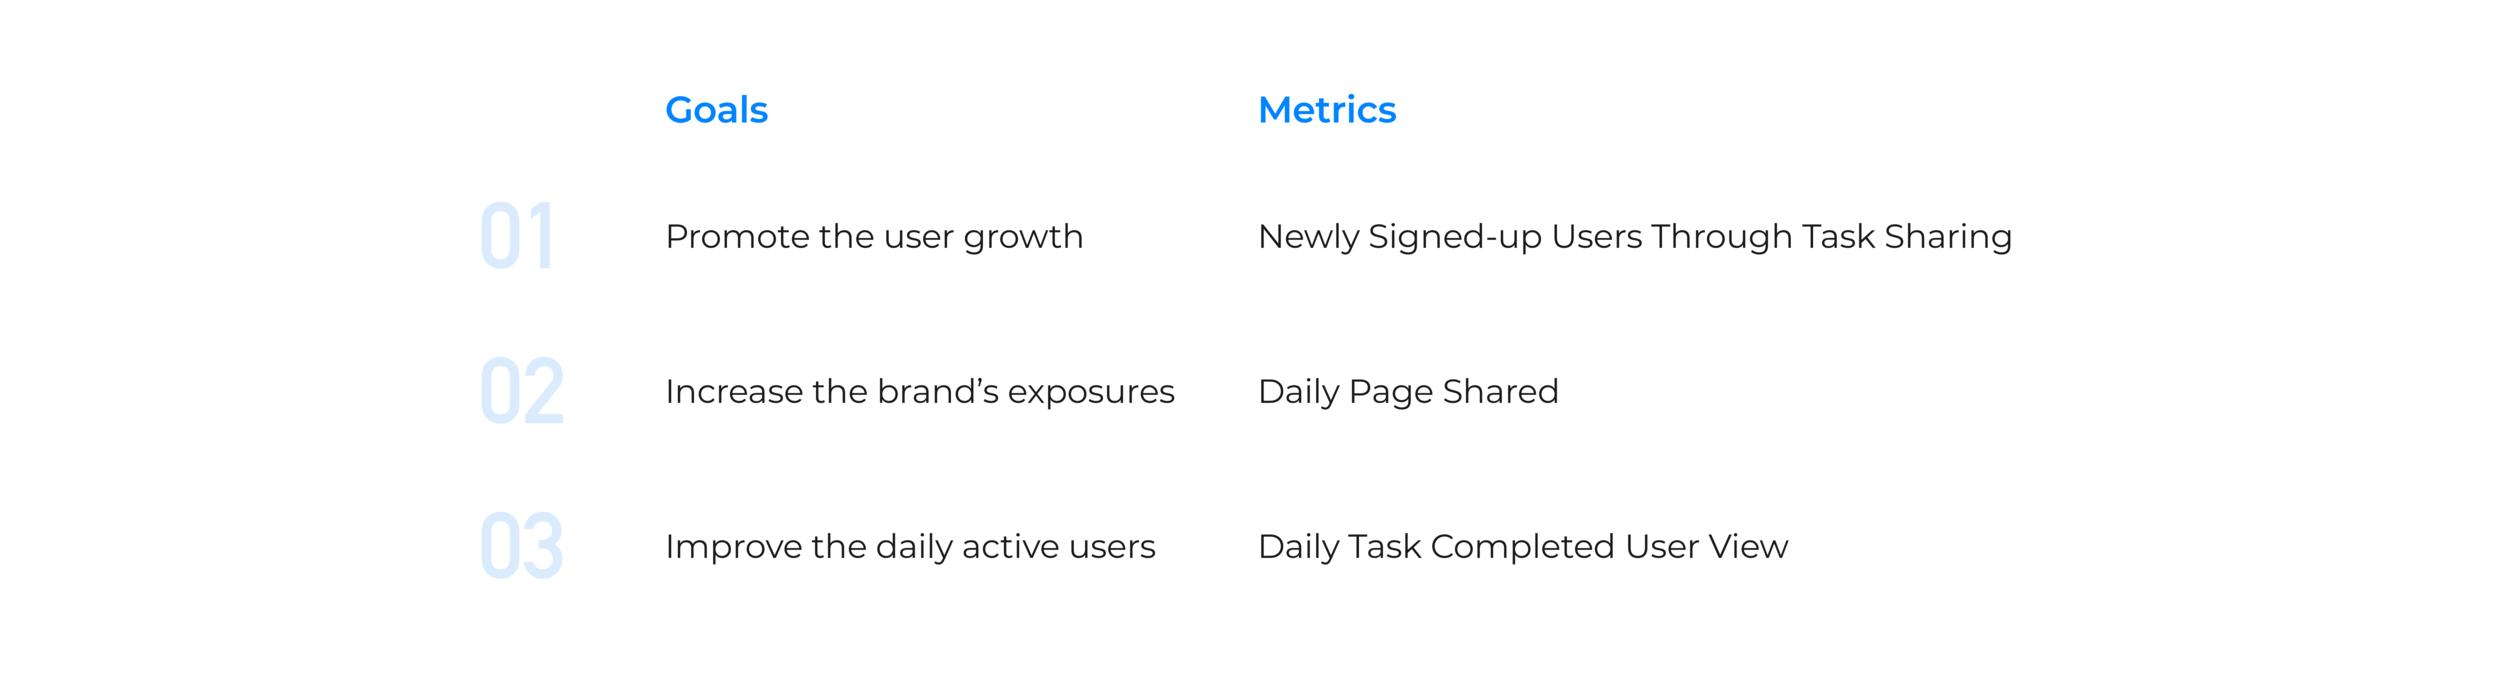 success metrics.png